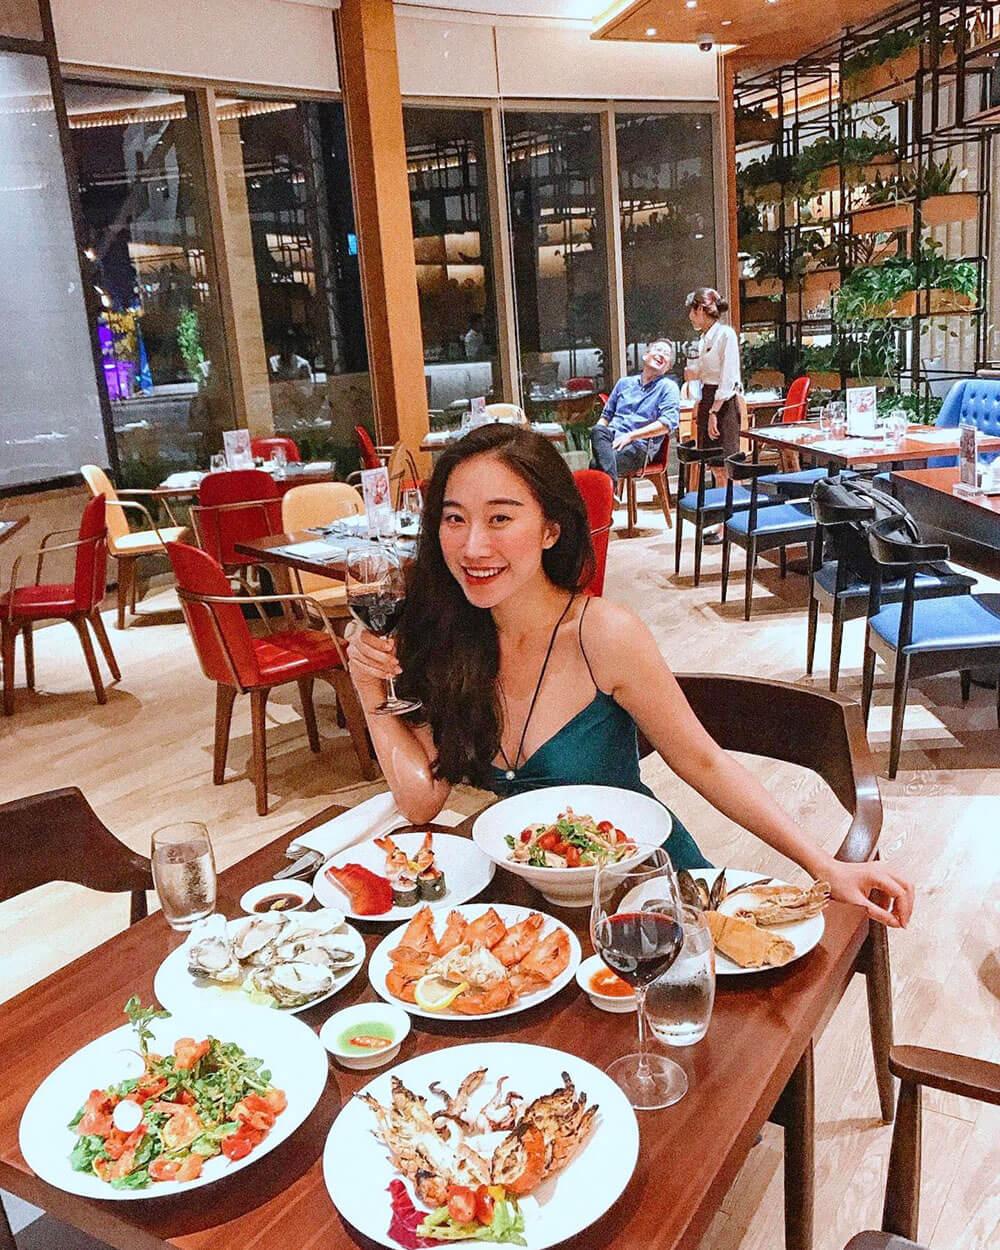 5 Ly Do Ban Khong The Bo Lo Tiec Buffet Hai San Toi Thu Sau Hang Tuan Tai Nha Hang Brasserie Nam Hilton Danang